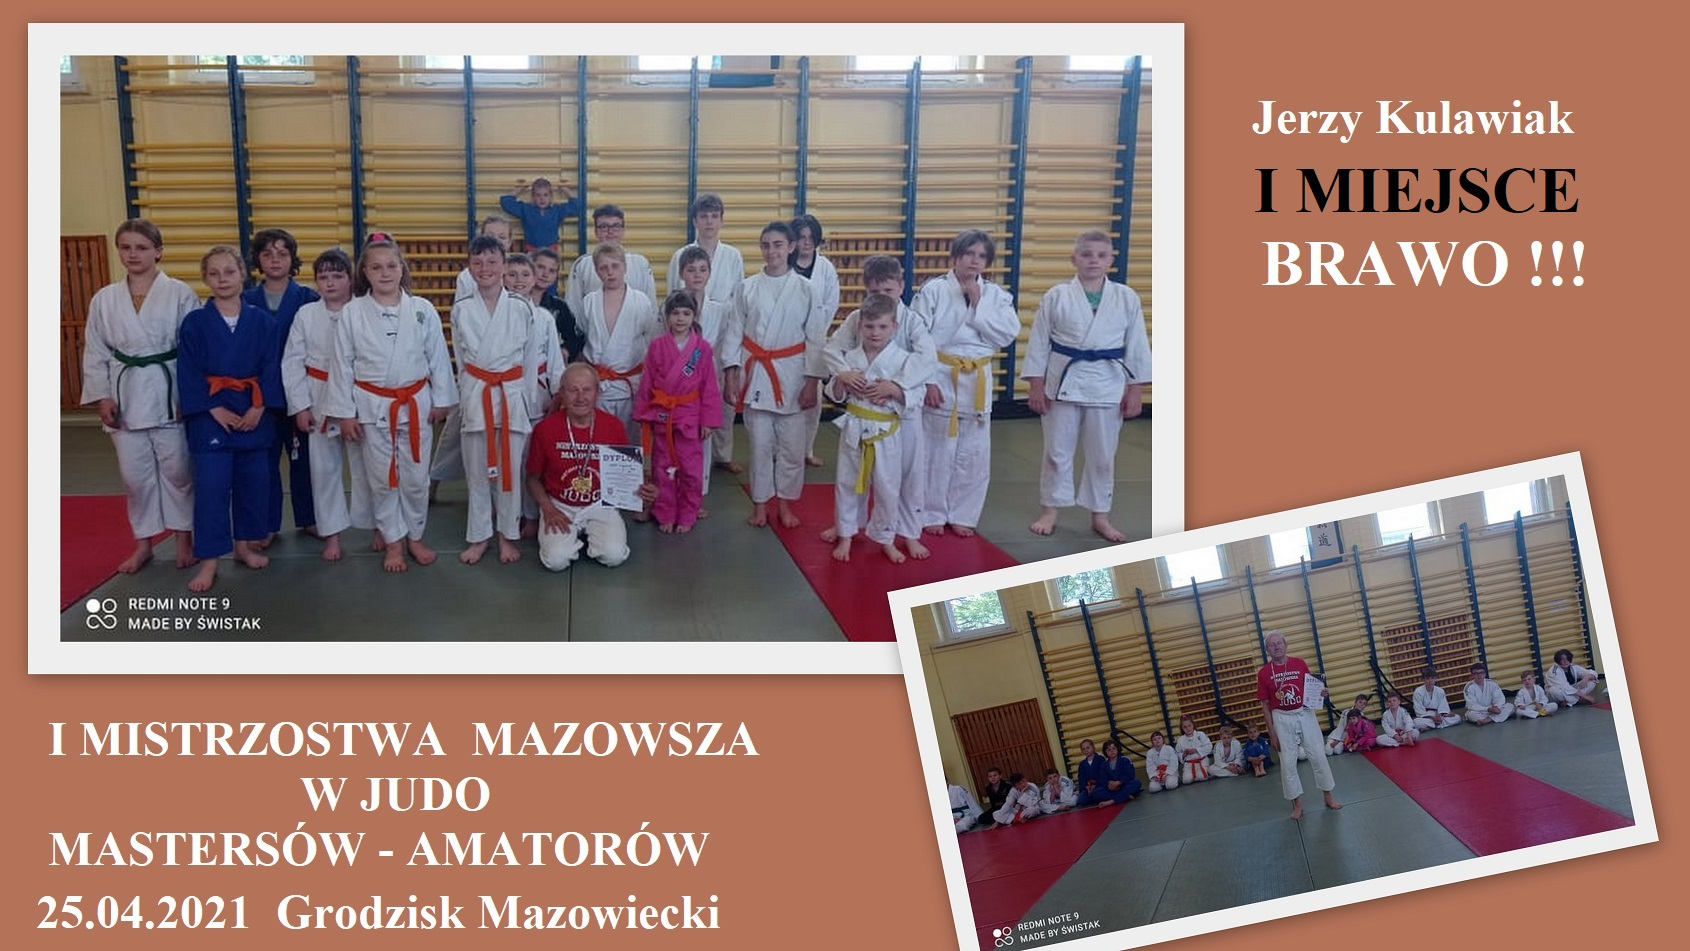 http://judo.bedzin.pl/wp-content/uploads/2021/06/jurek.jpg